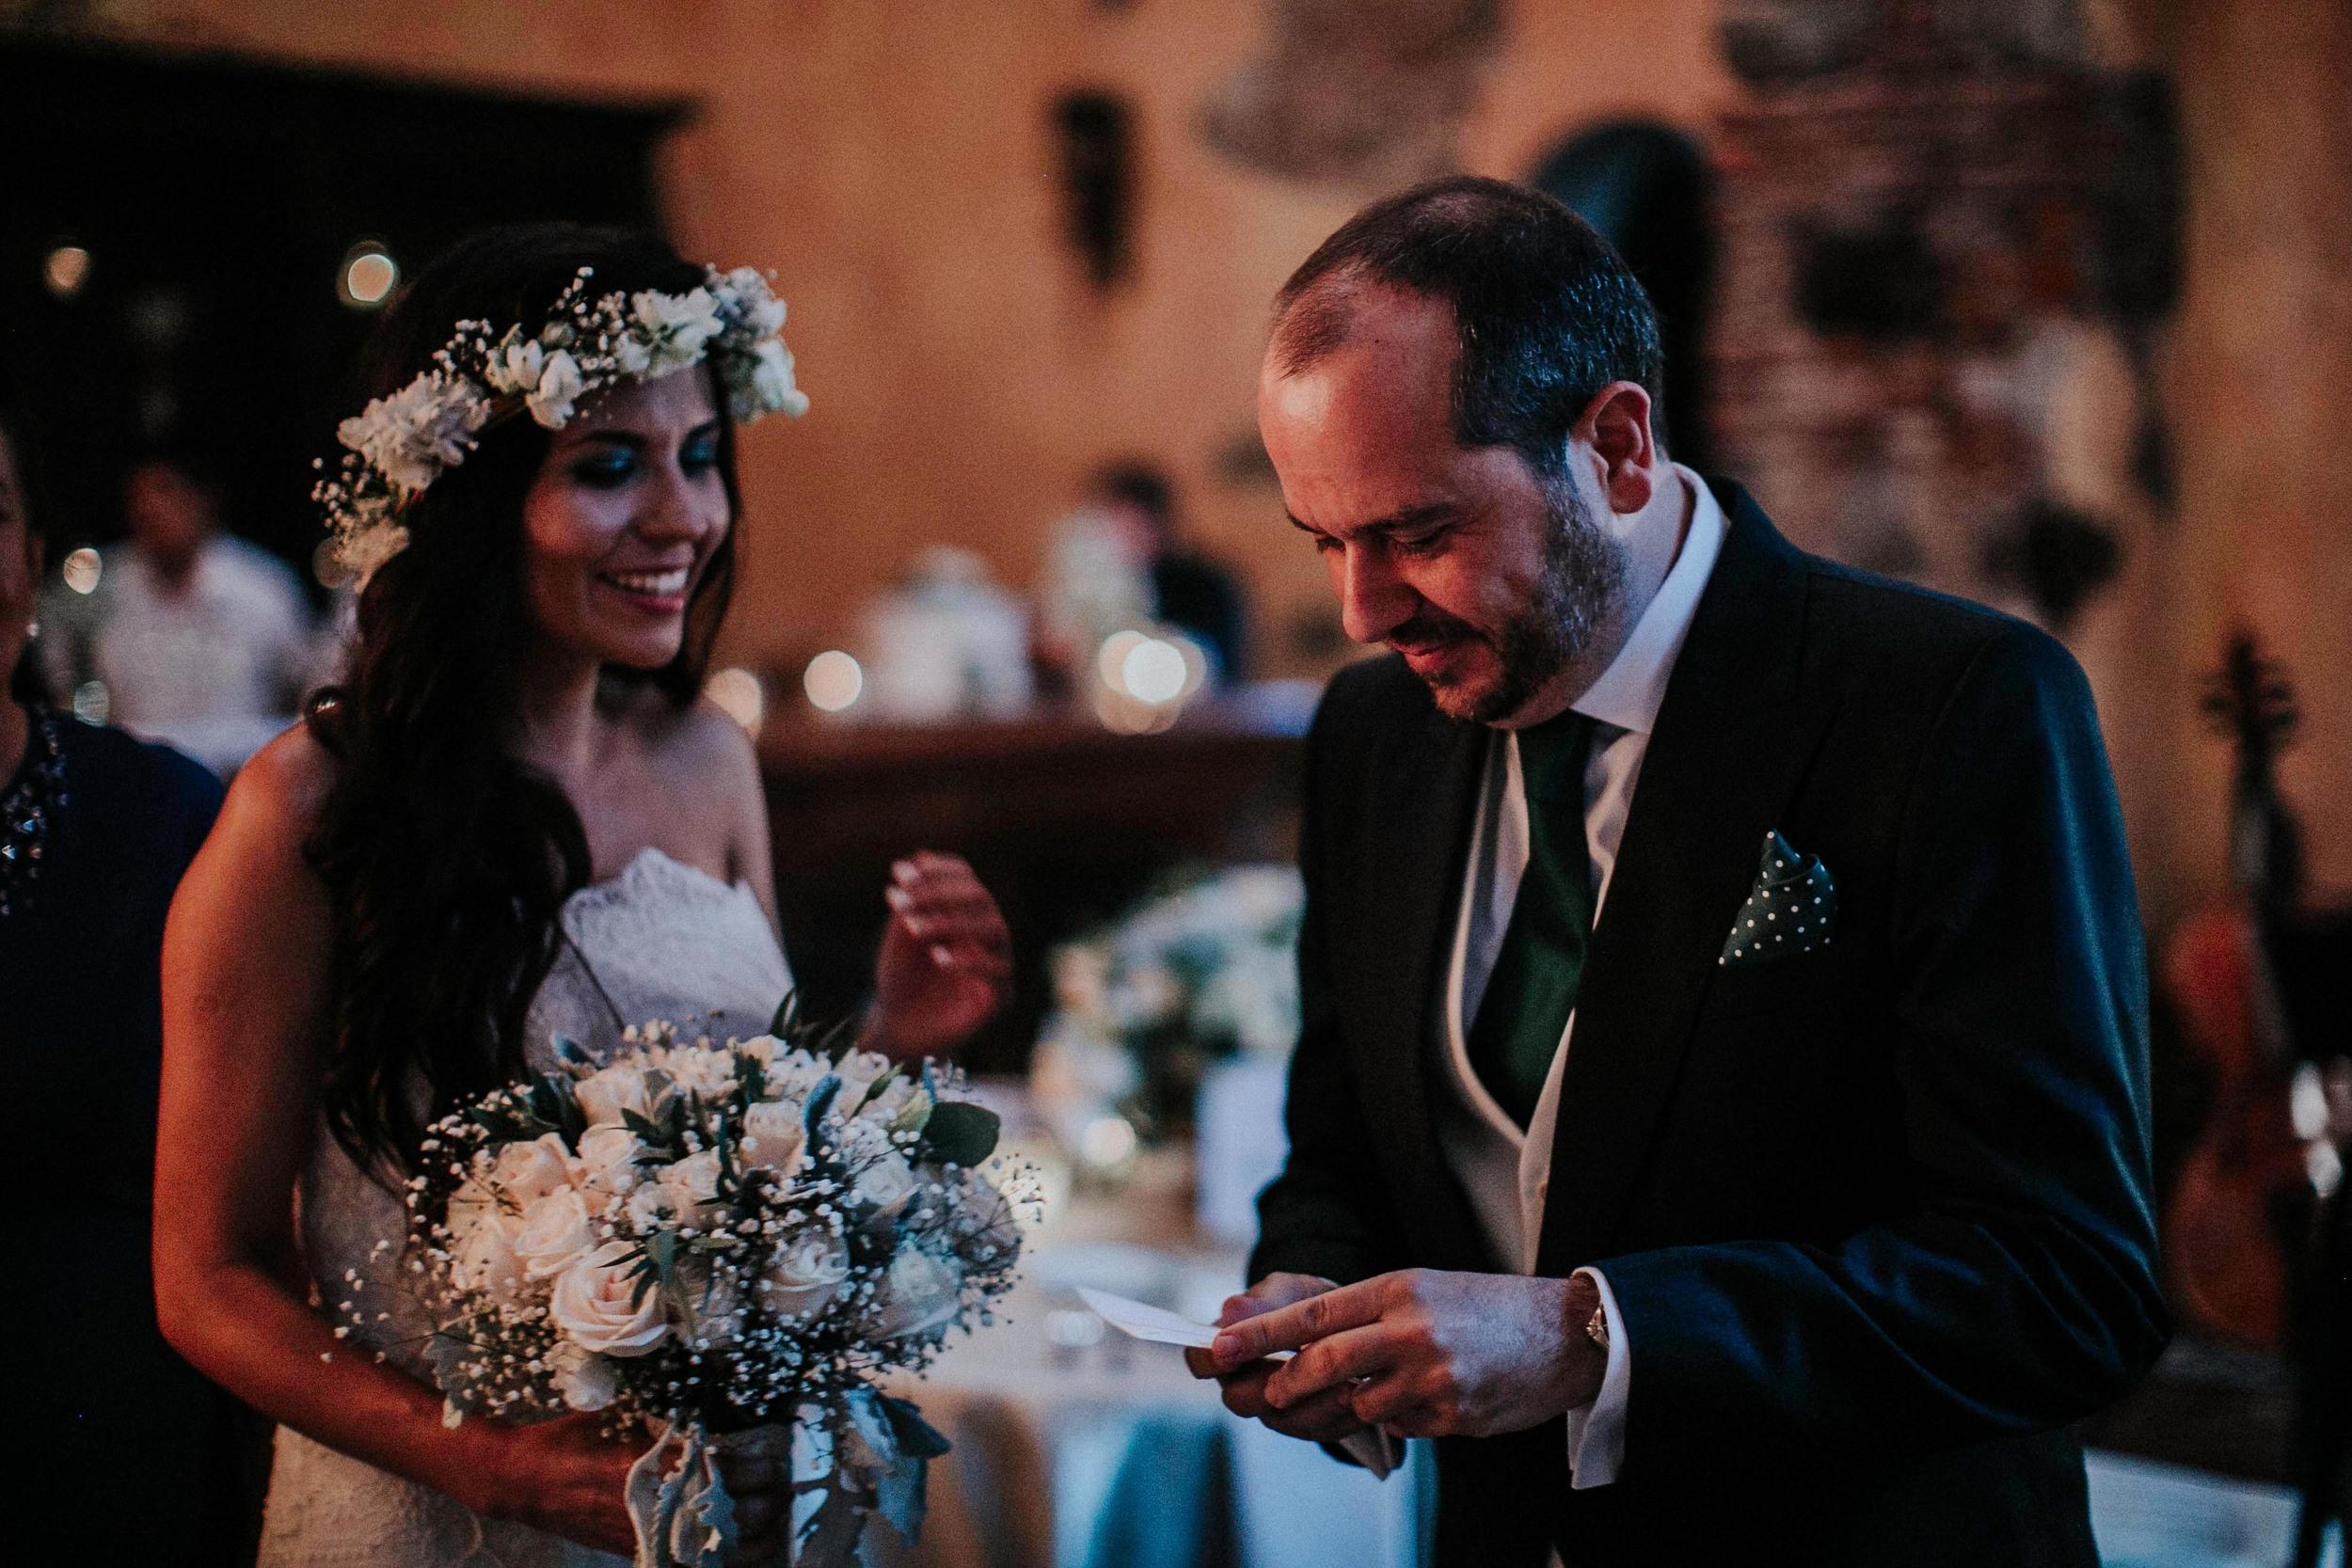 DJ8A9007-Editaralfonso_flores_destination_wedding_photographer_San_gabriel_de_las_palmas.jpg